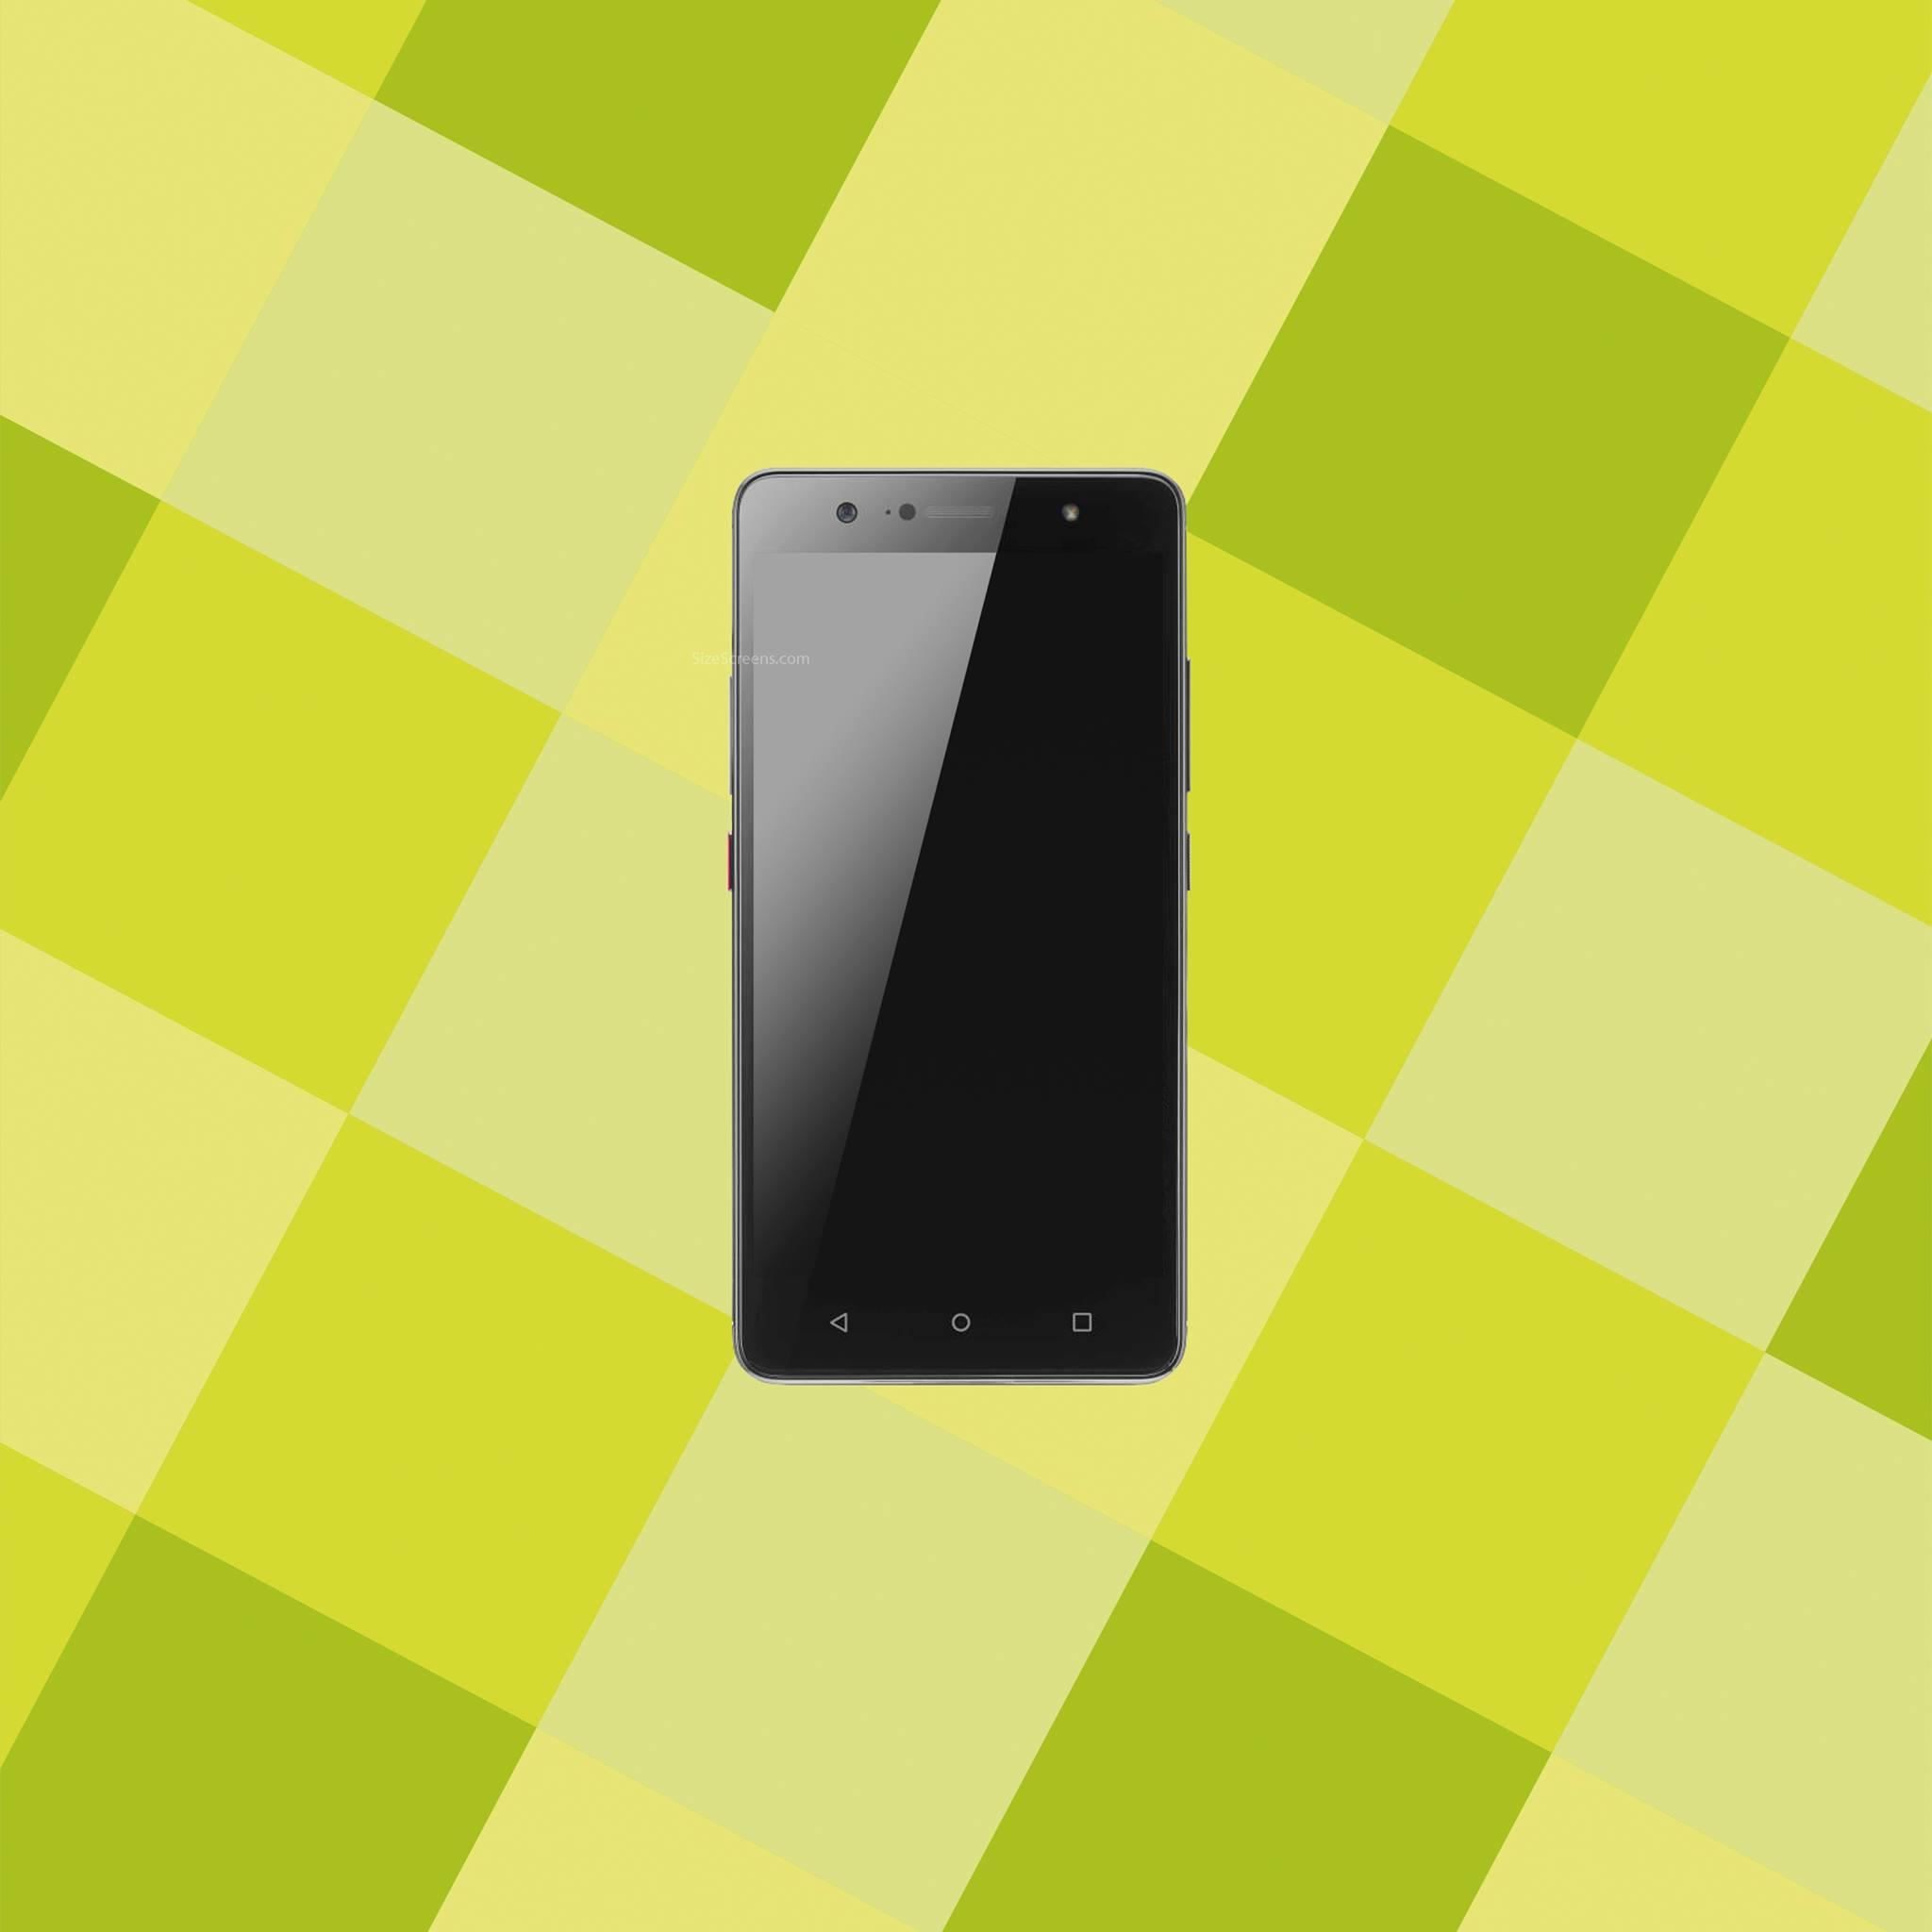 Harga Lenovo K8 Plus lenovo k8 plus screen specifications sizescreens